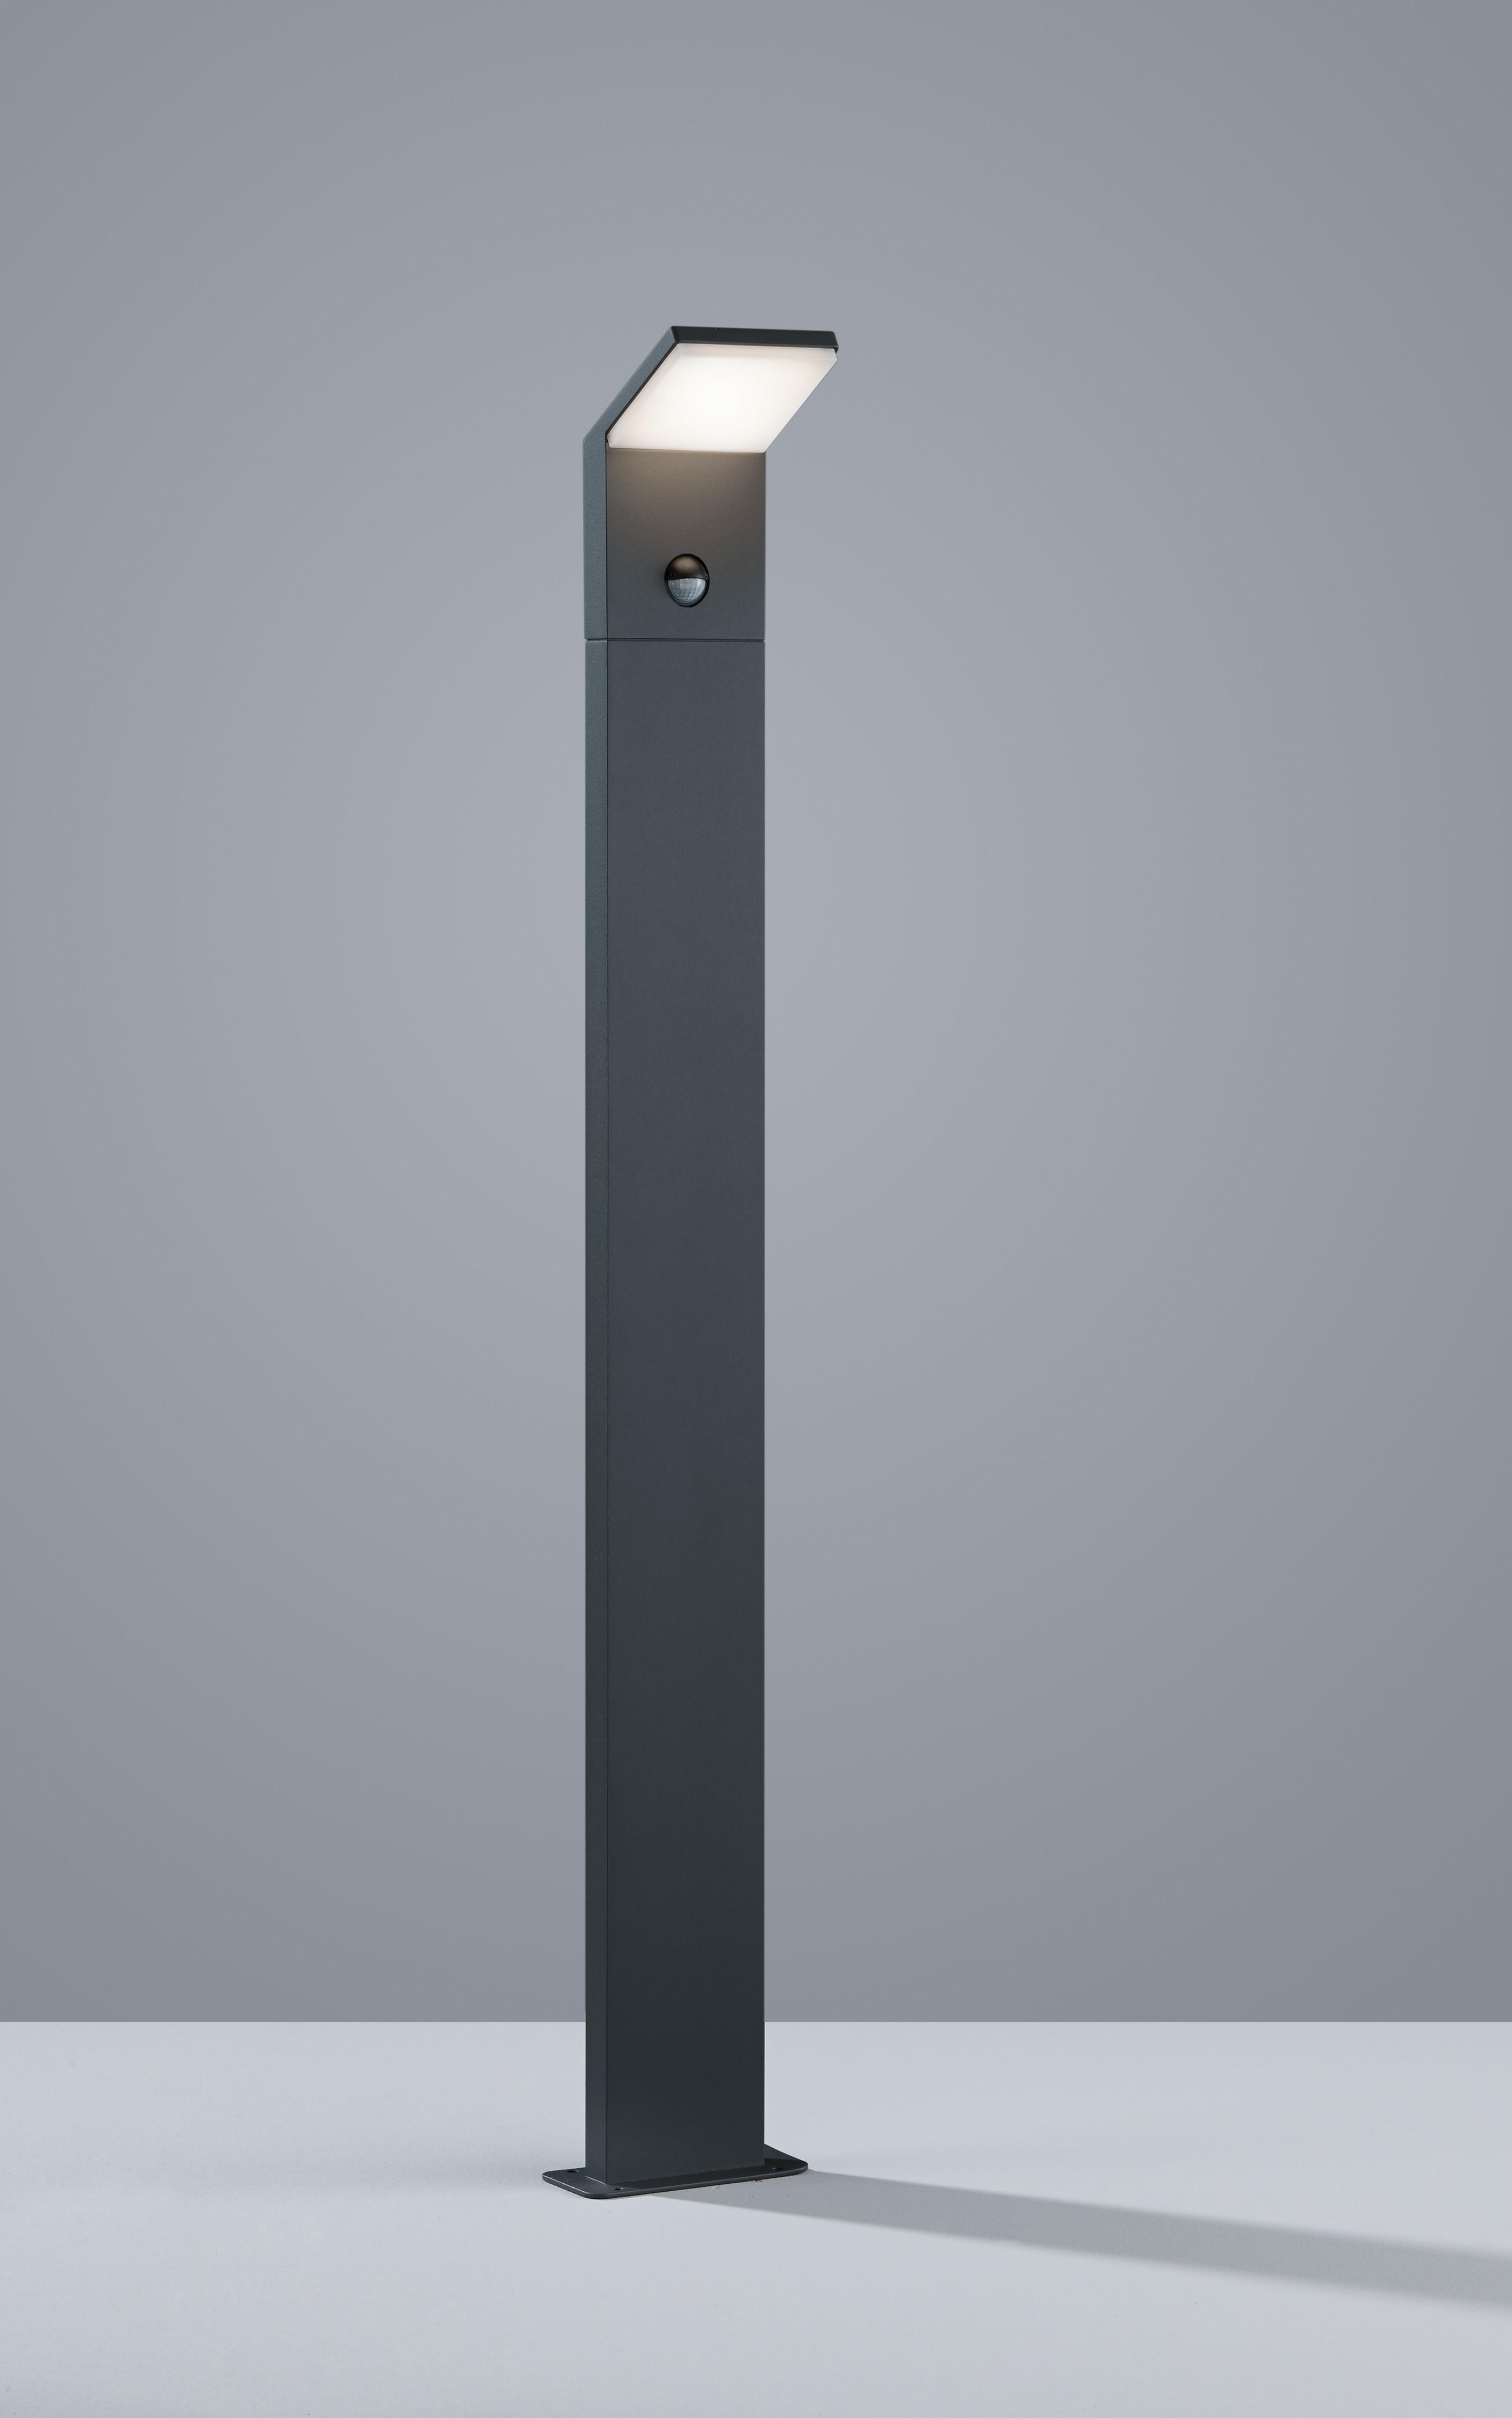 trio leuchten led aussen pollerleuchte pearl aluminiumguss anthrazit 521169142. Black Bedroom Furniture Sets. Home Design Ideas